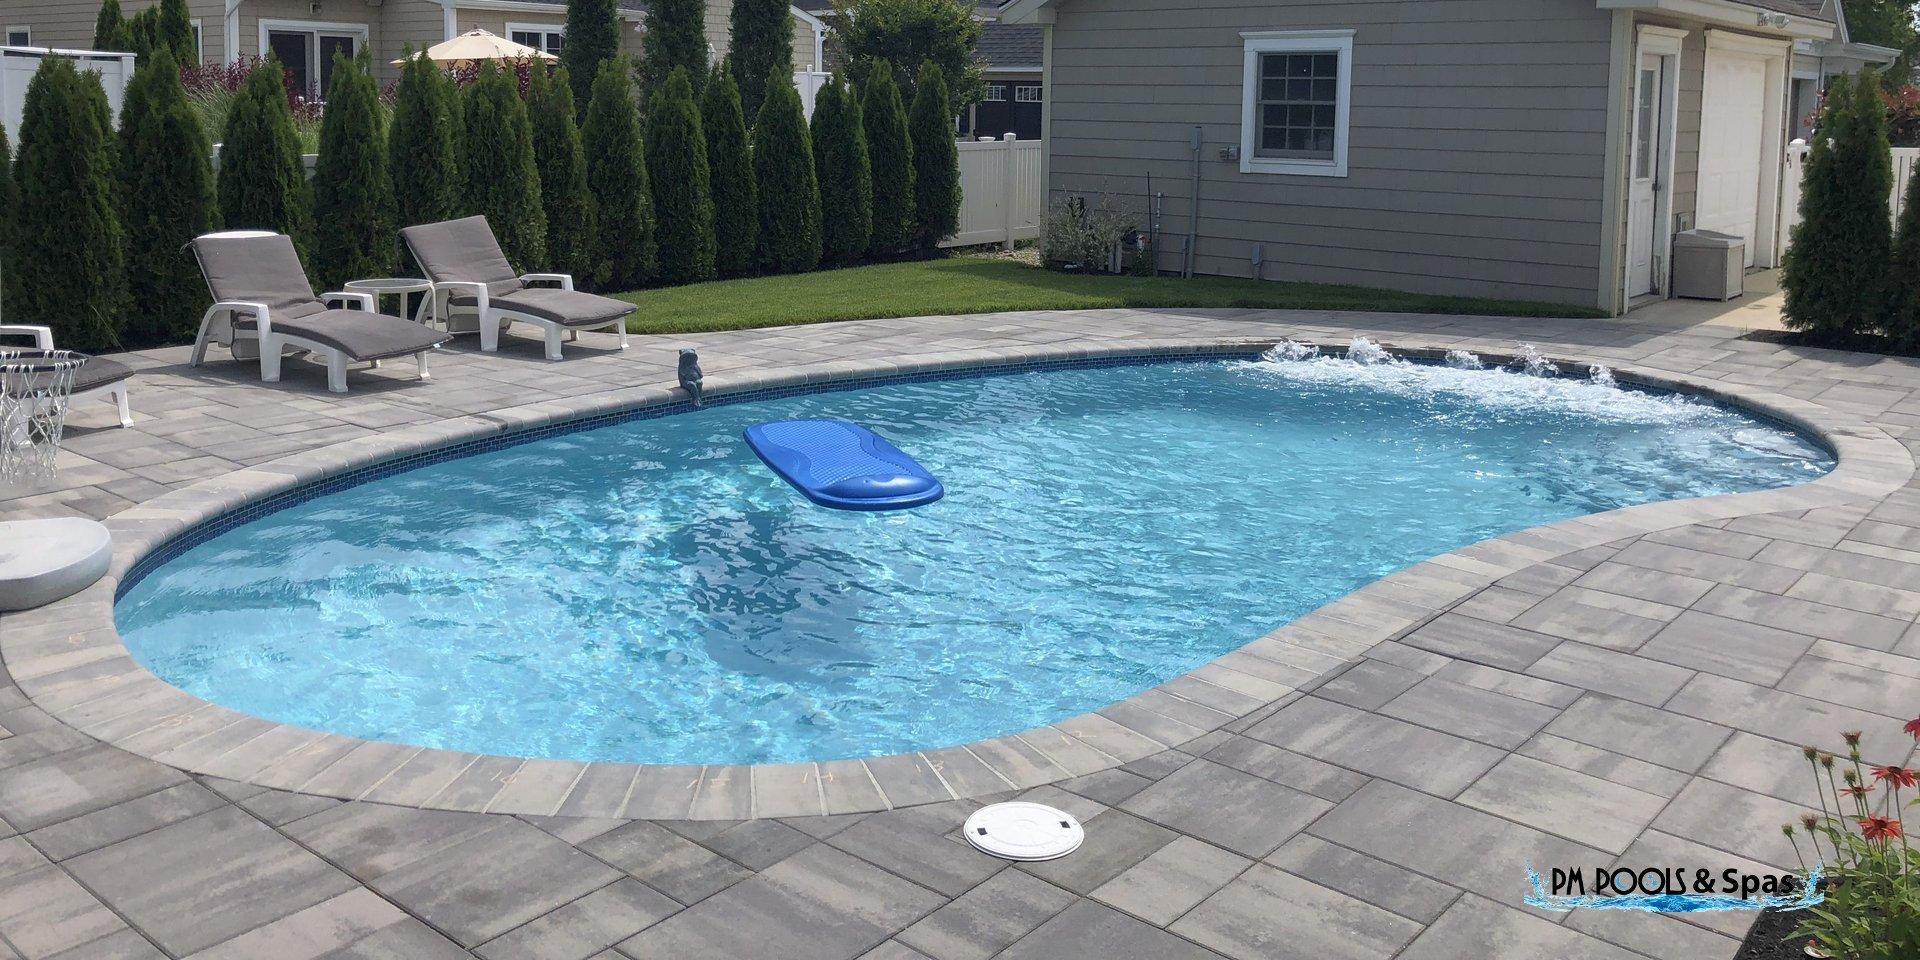 Concrete Swimming Pools Avalon - P.M. Pool